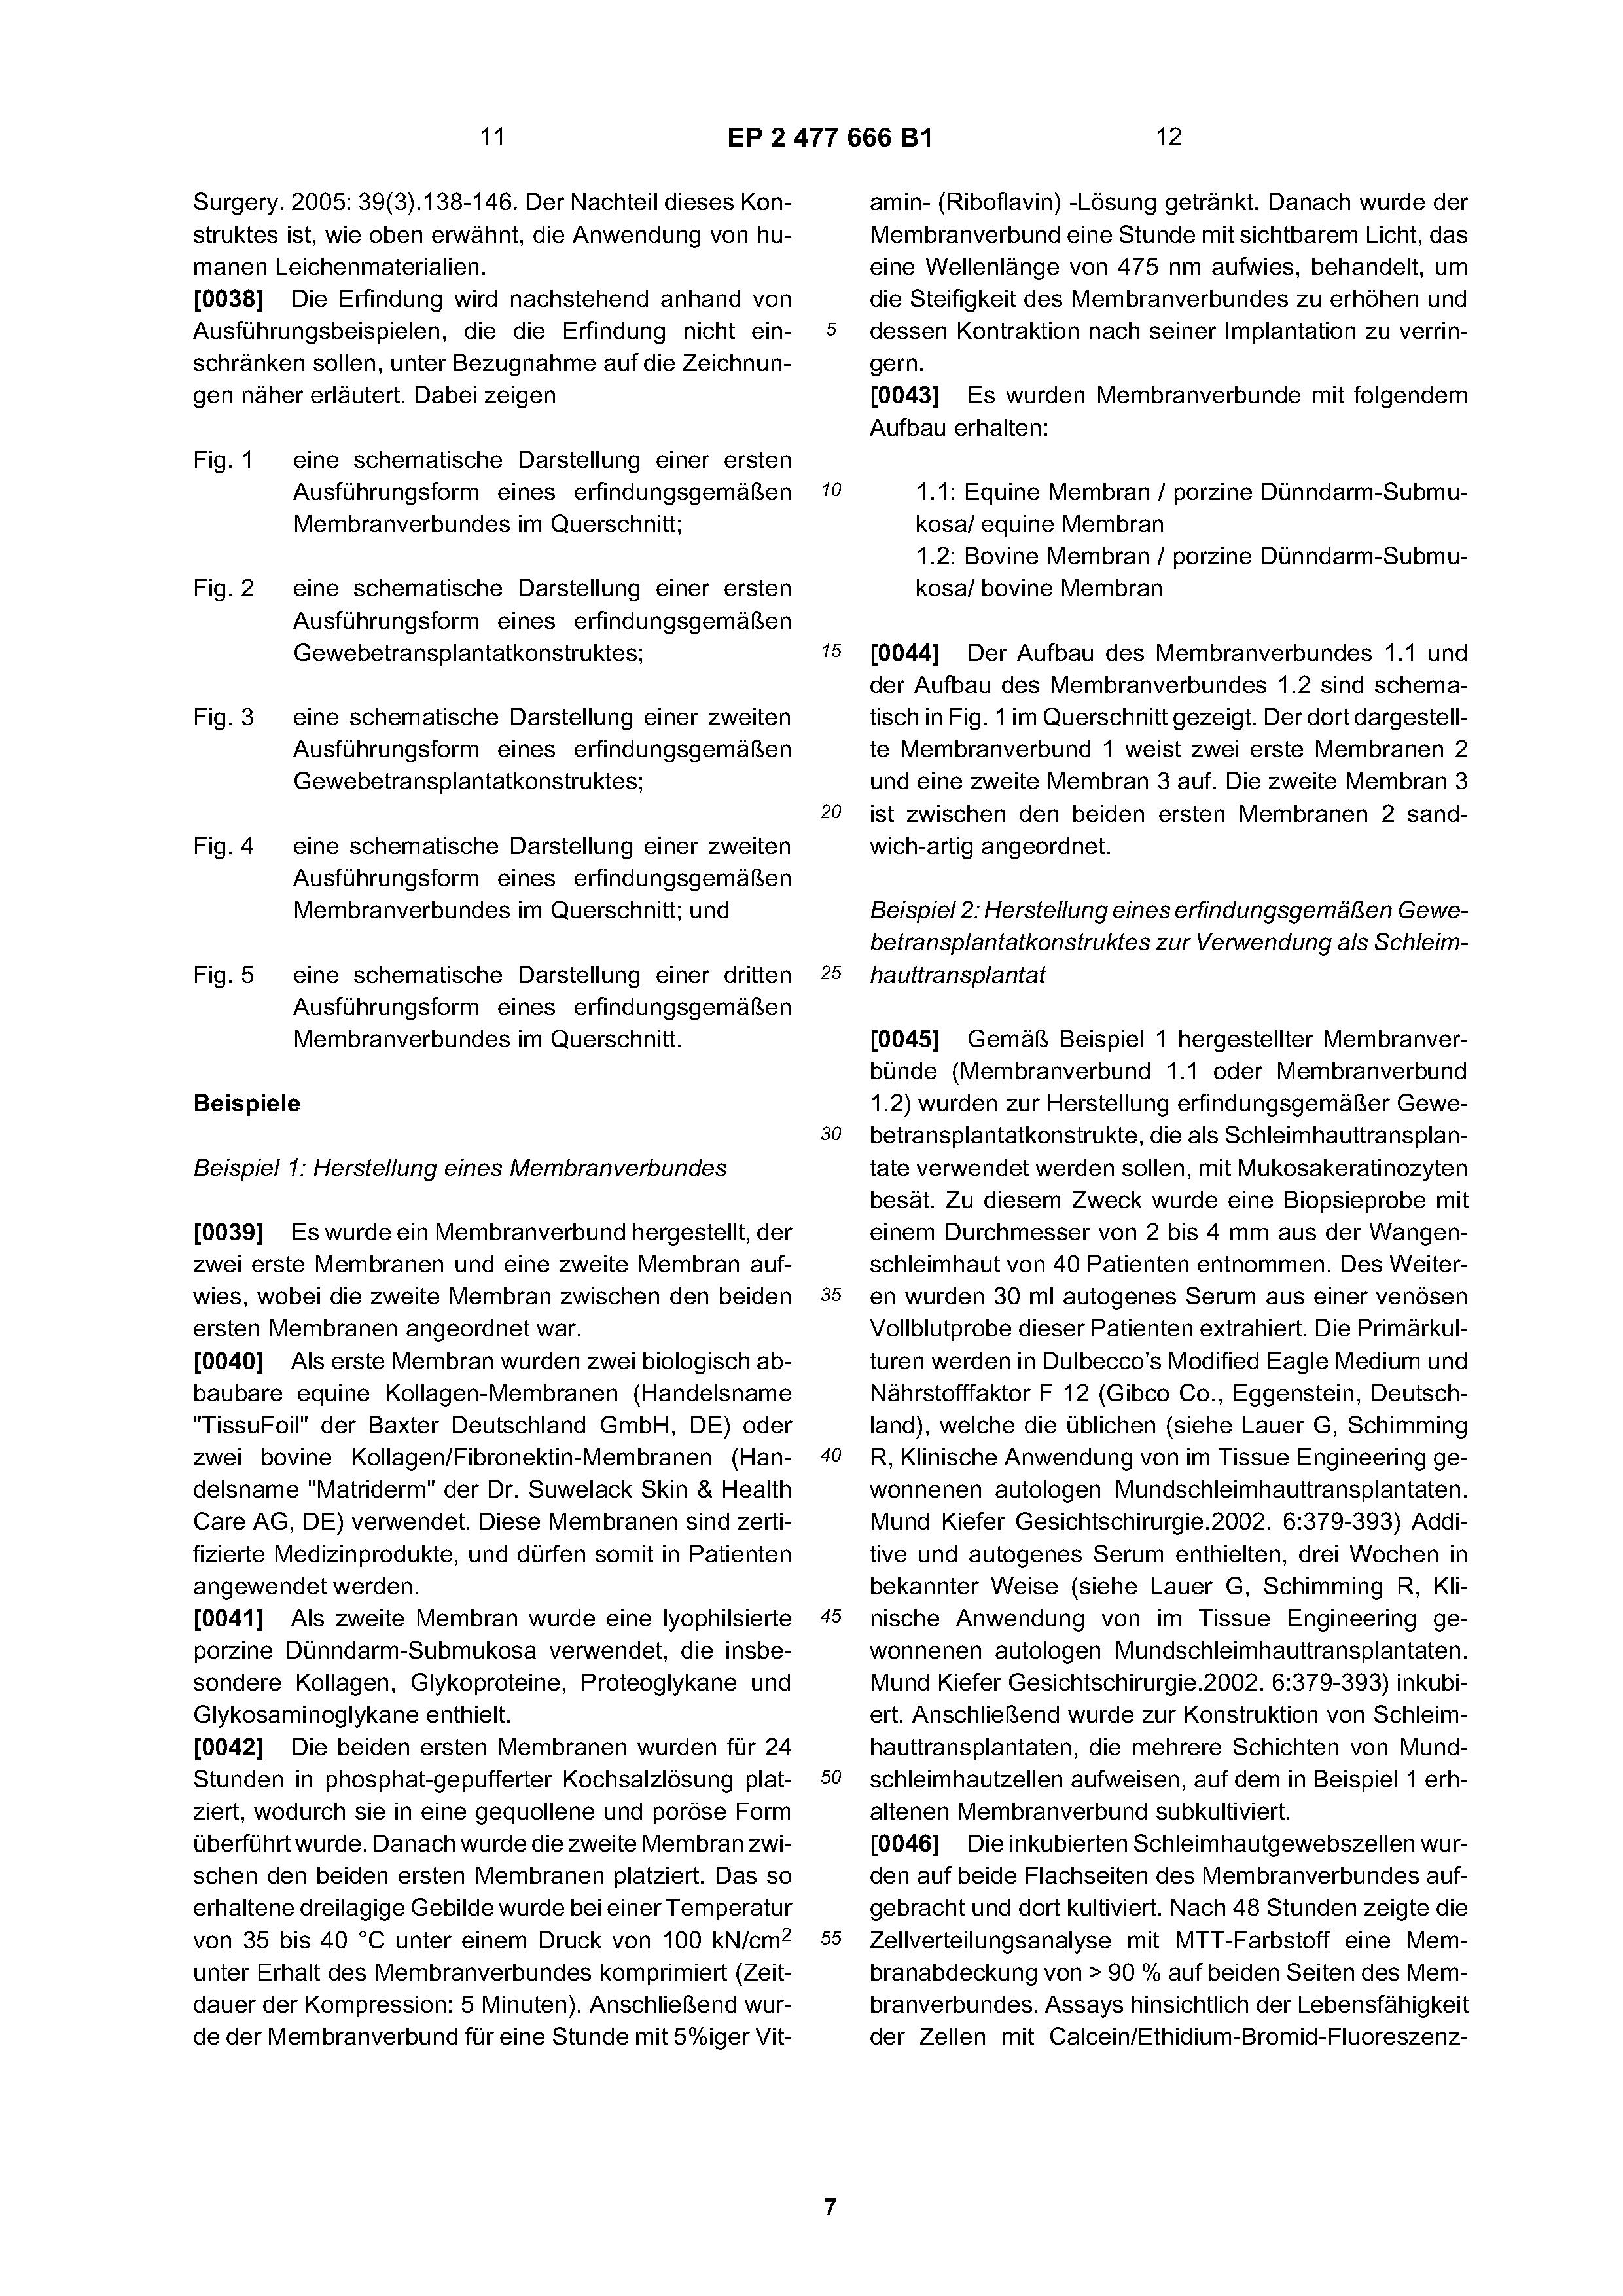 Funky Transport Durch Membranen Powerpoint Arbeitsblatt Antworten ...